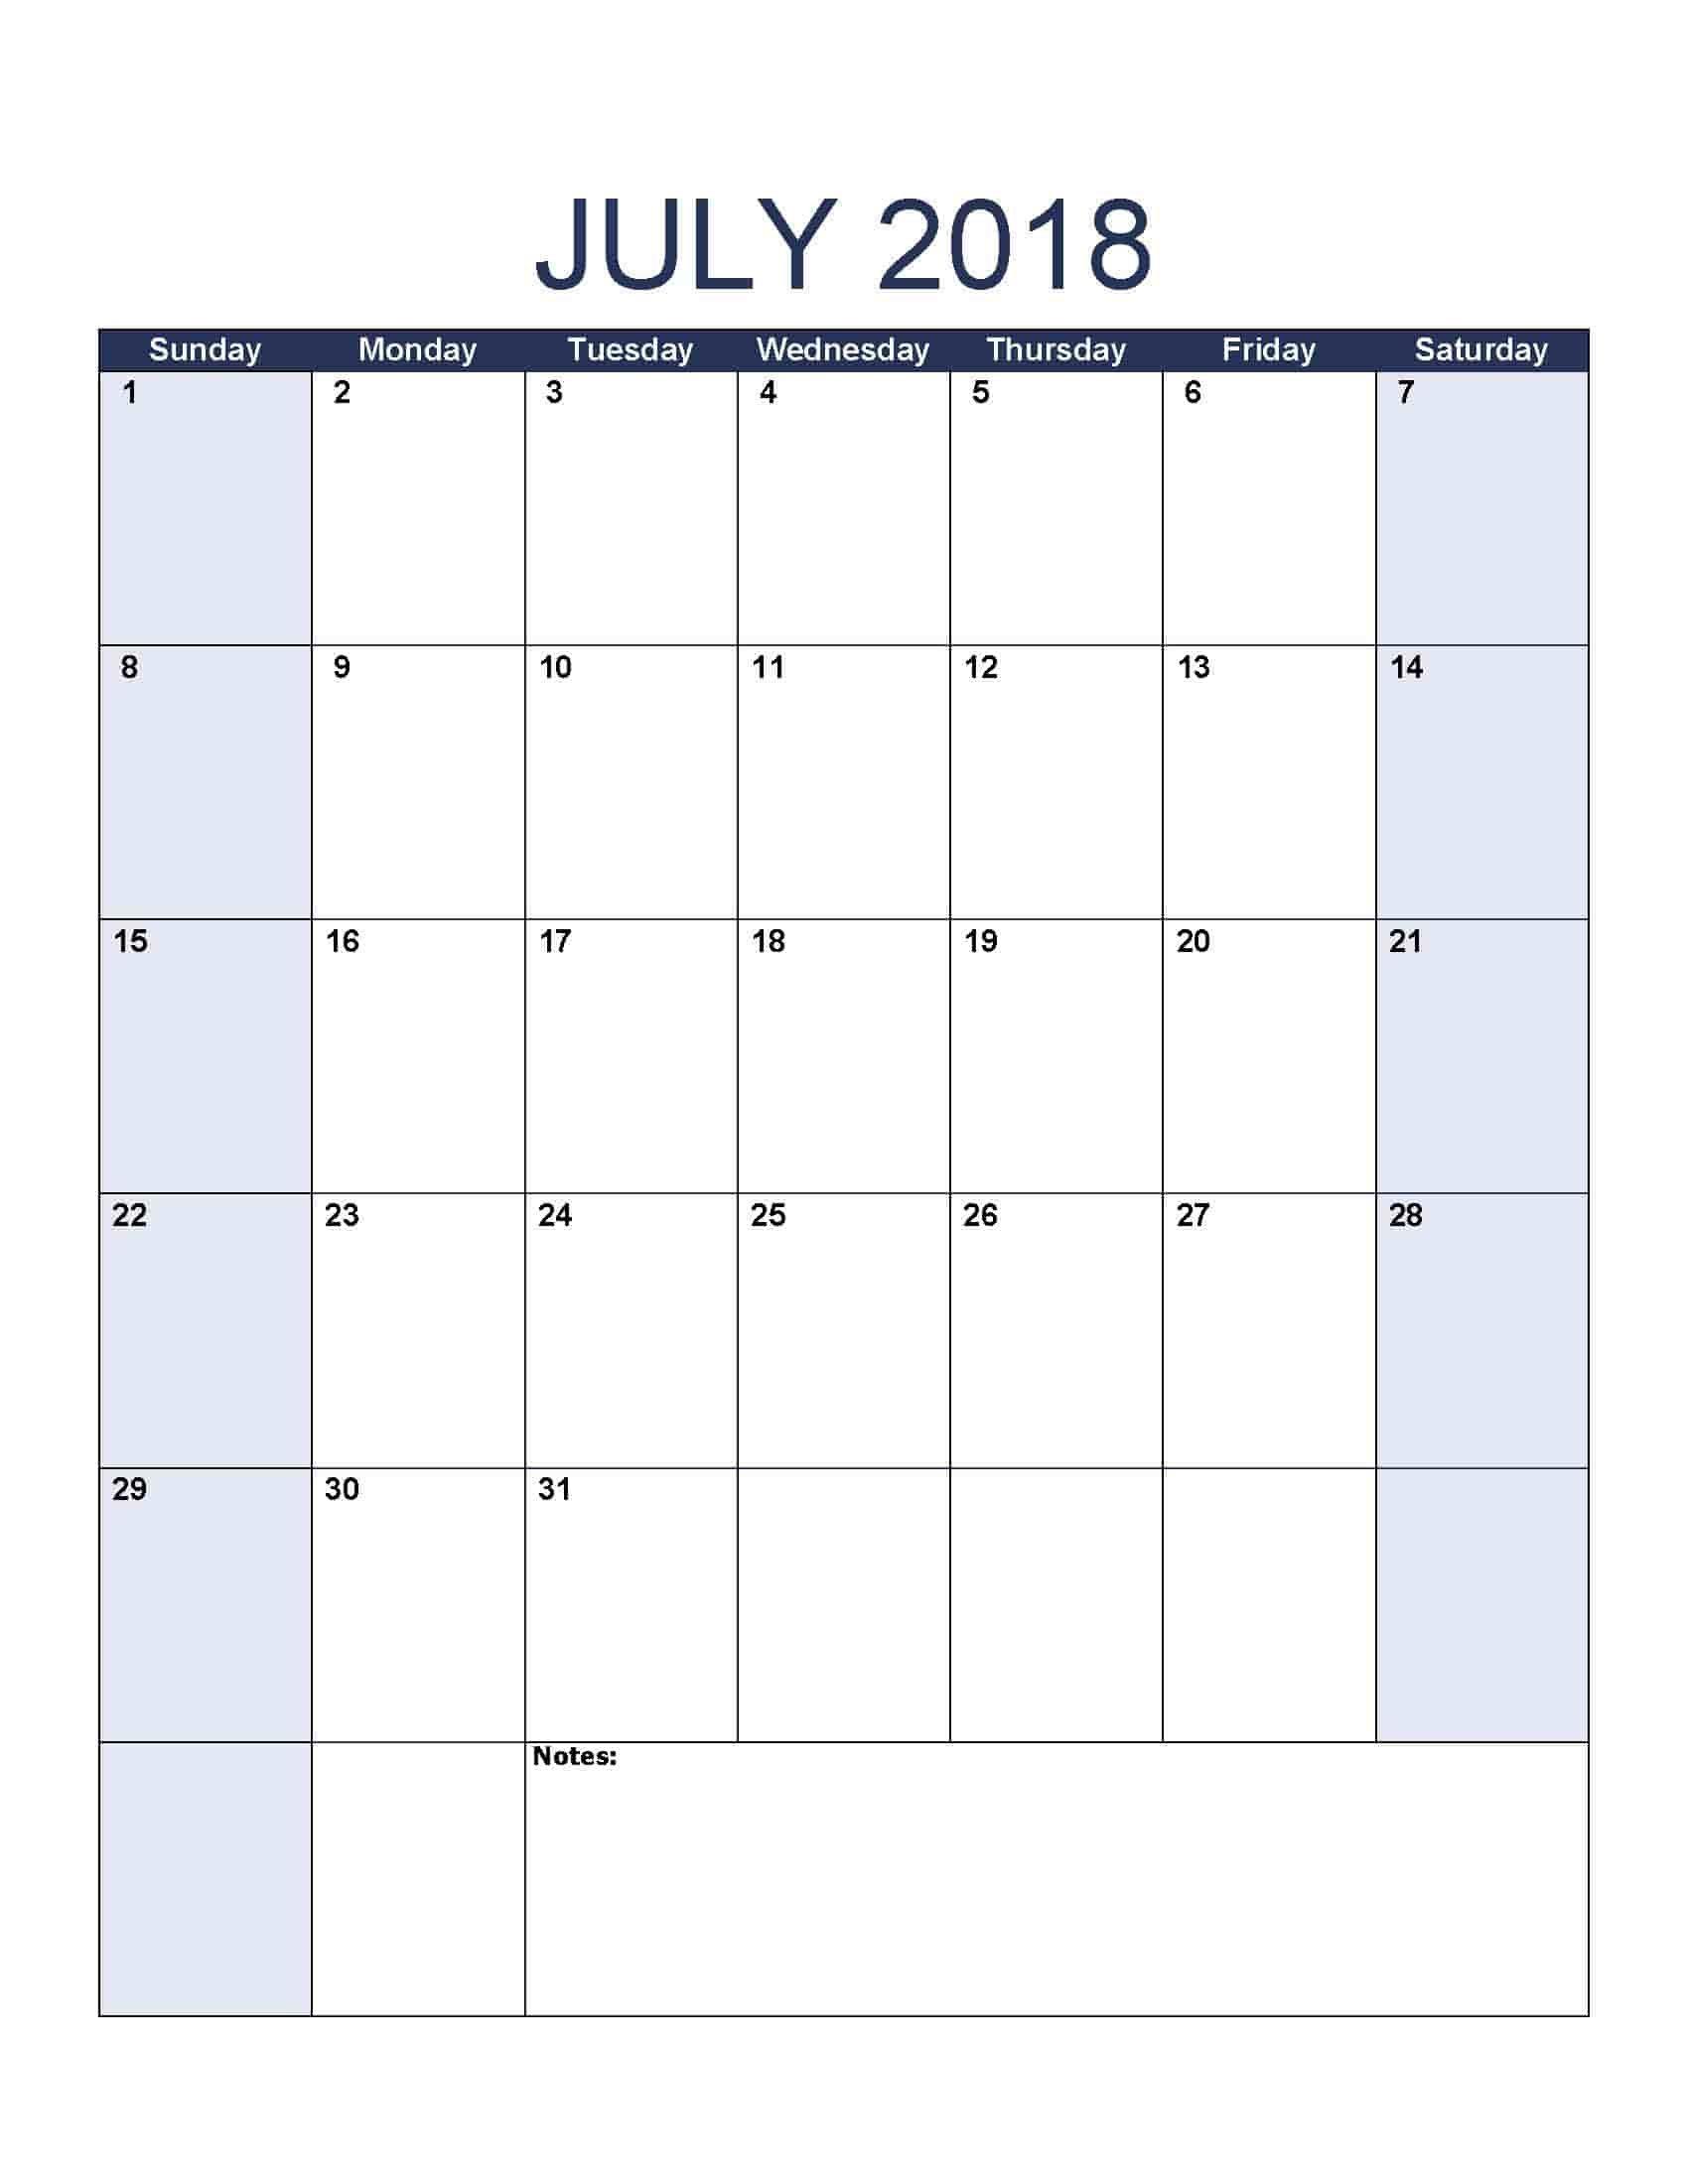 July 2018 Calendar - Free, Printable Calendar Templates Free Caolendar To Fill In Online